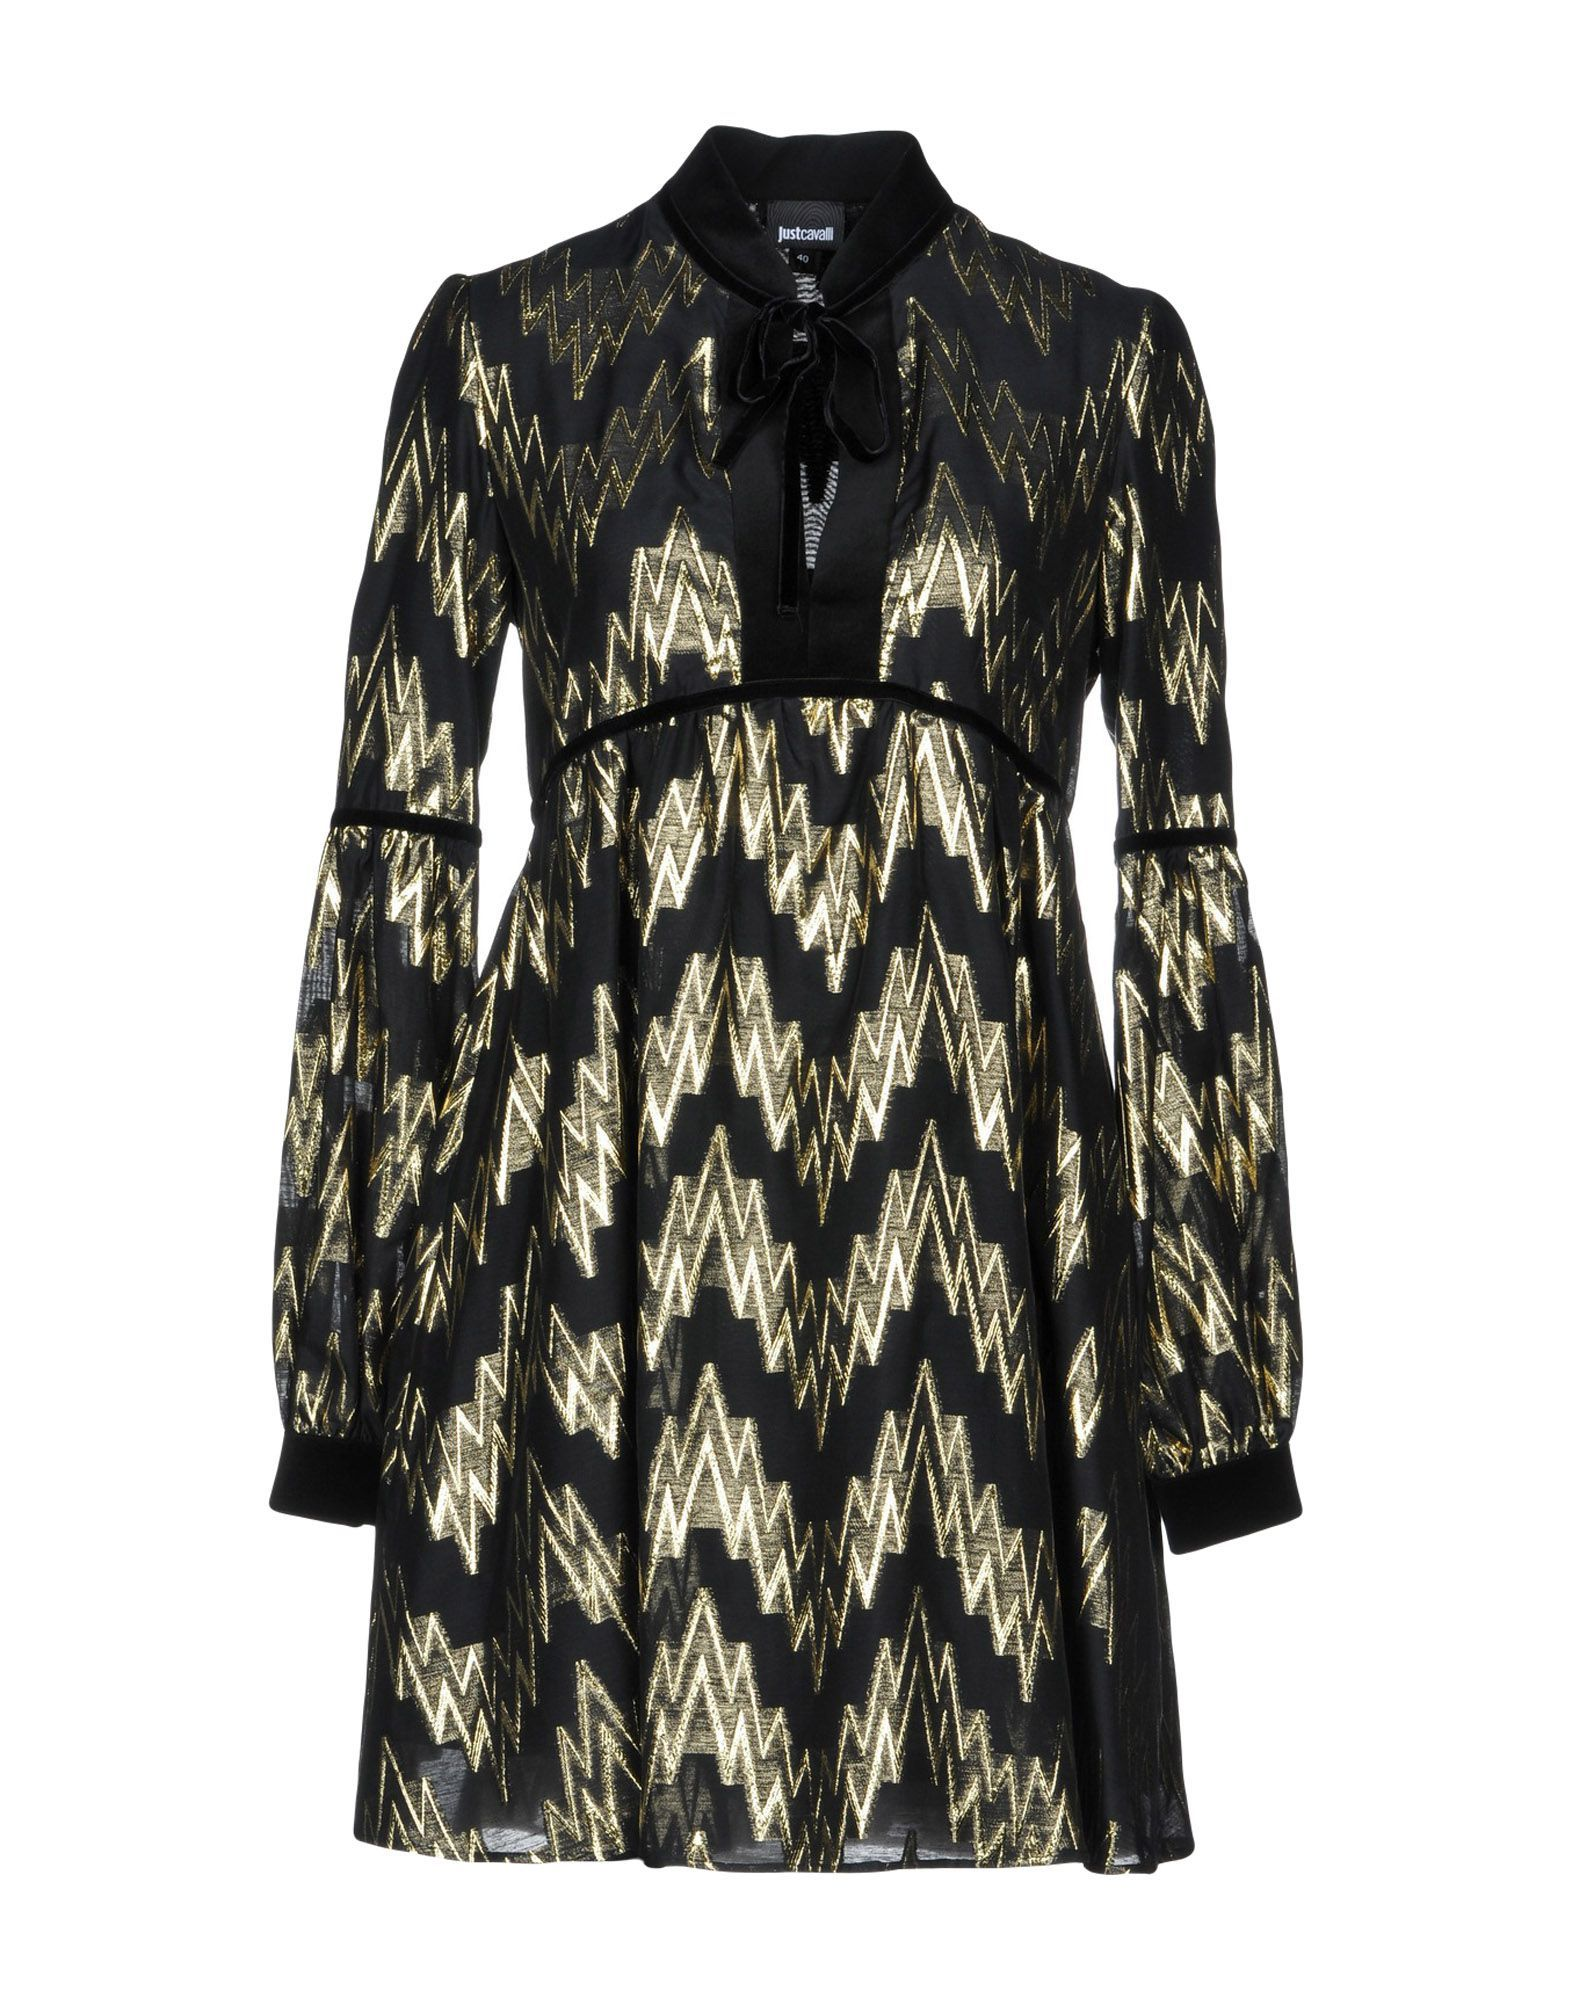 Just Cavalli Black Print Long Sleeve Short Dress